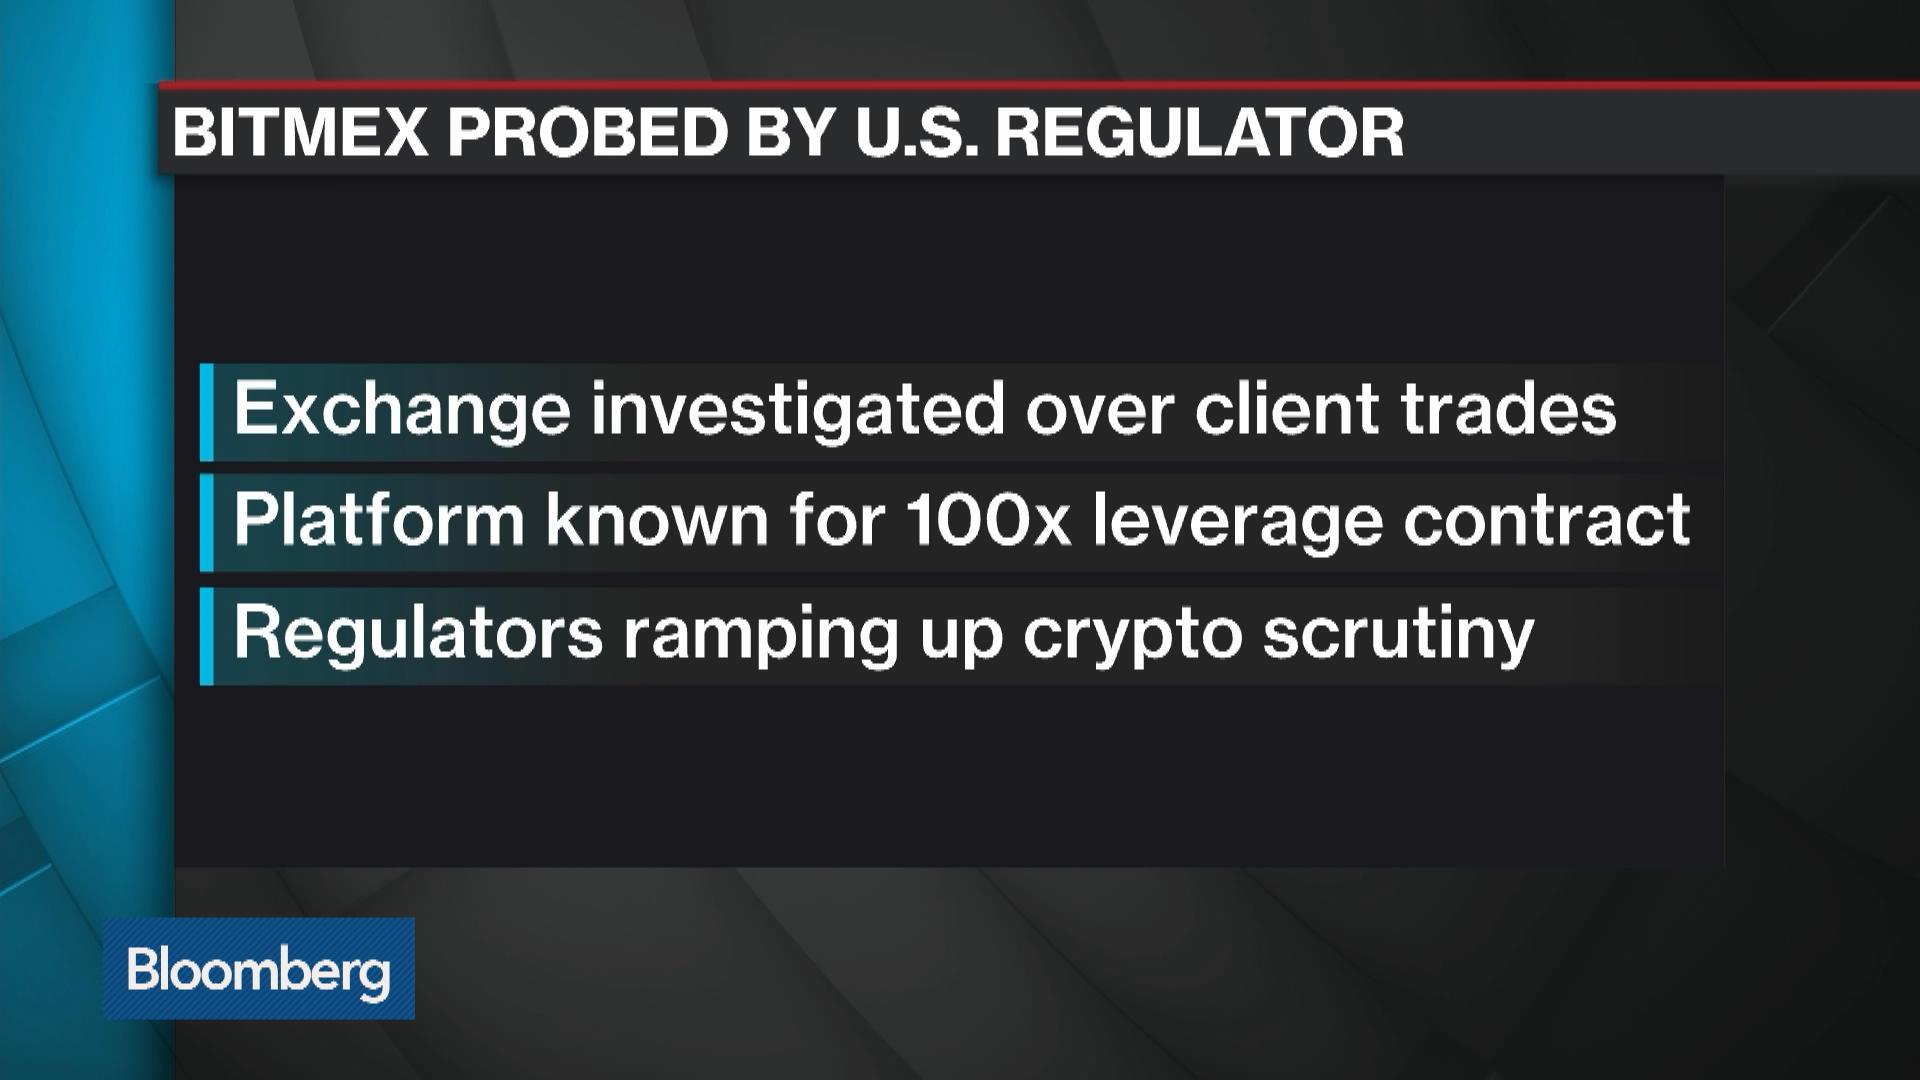 U S  Regulator Probing Crypto Exchange BitMEX Over Client